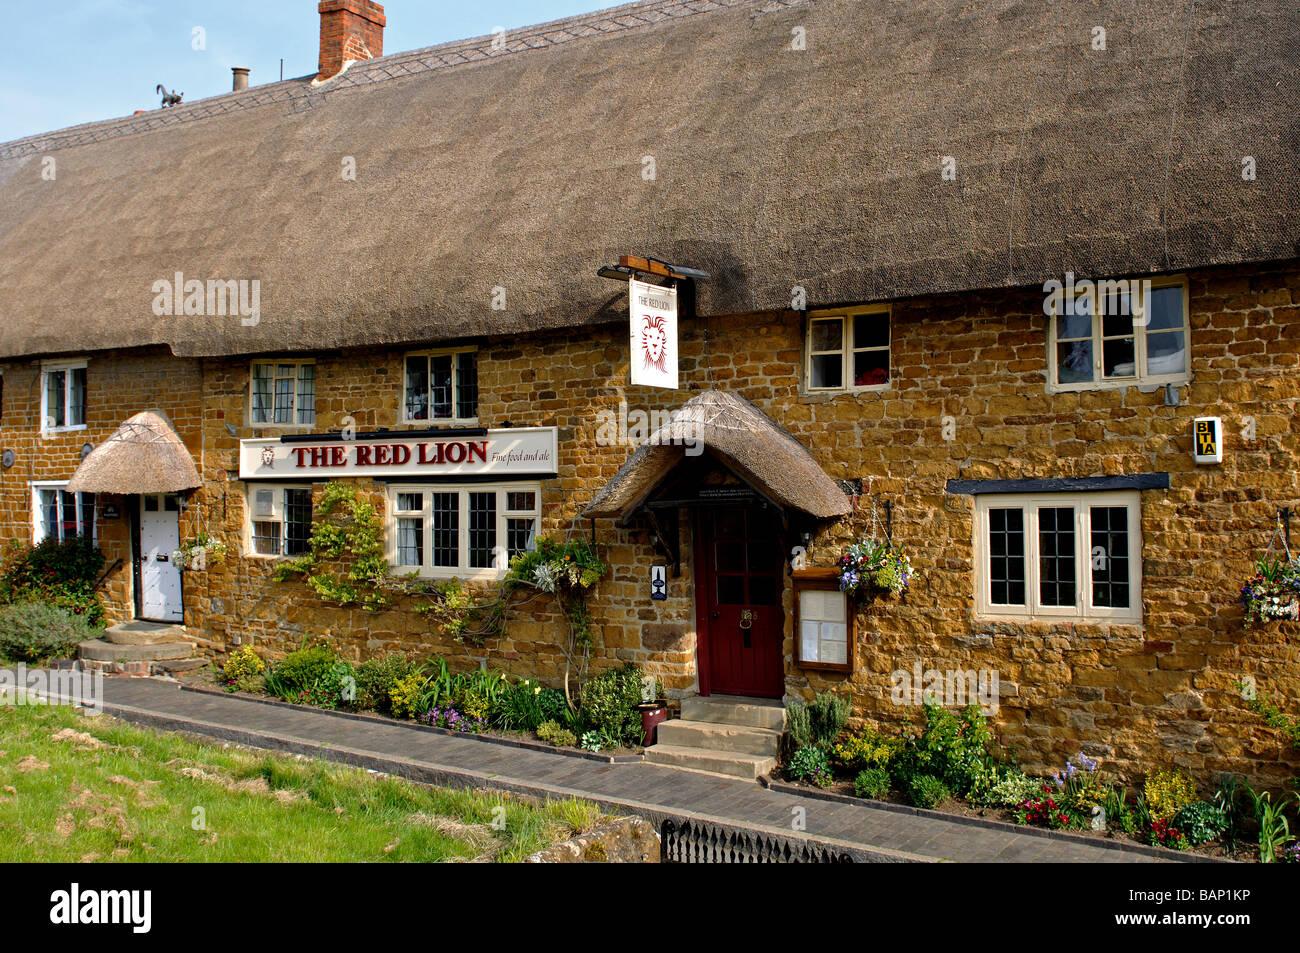 Red Lion pub, Cropredy, Oxfordshire, England, UK - Stock Image